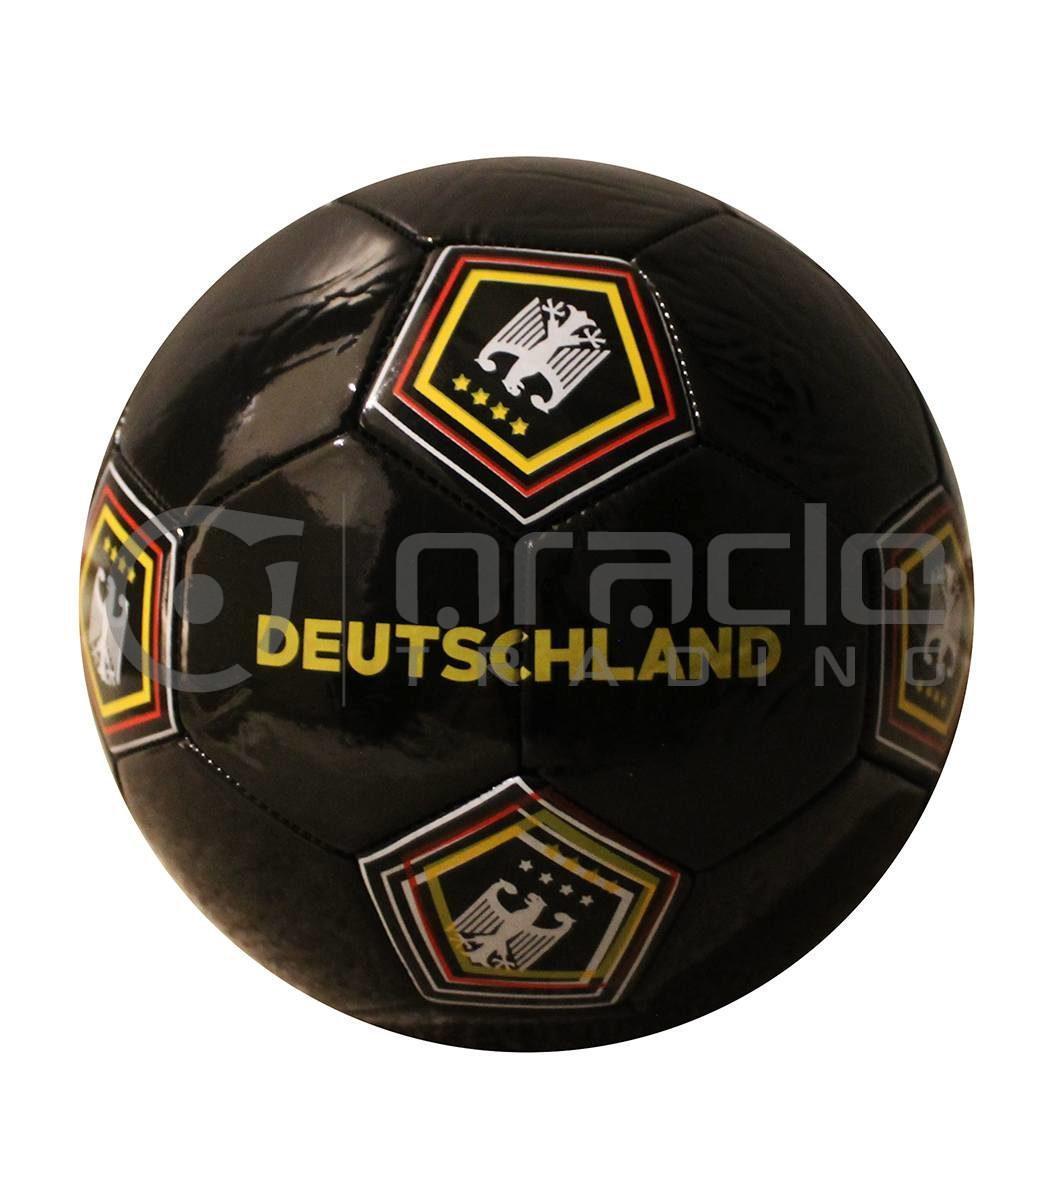 Germany Large Soccer Ball - Black